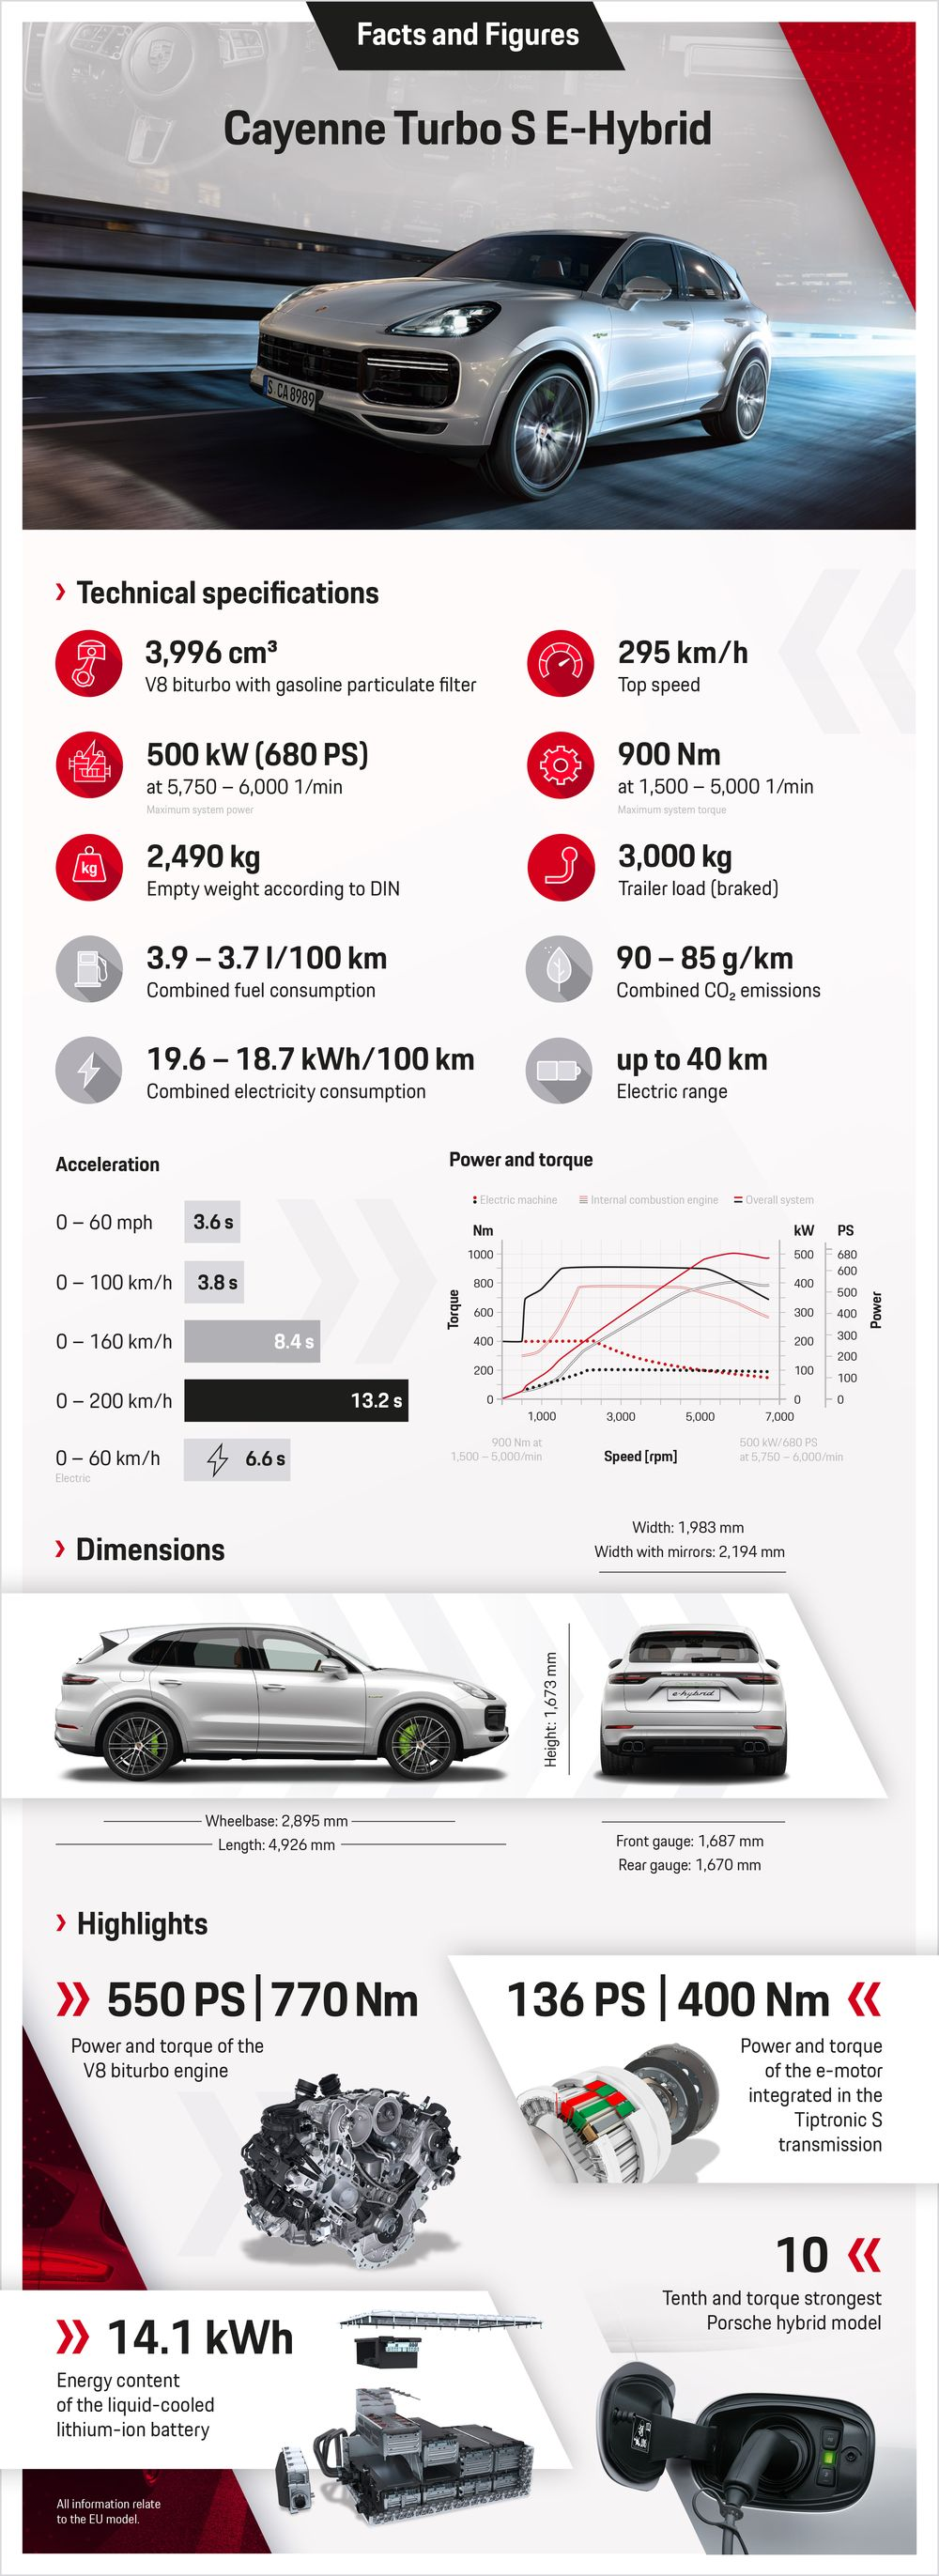 Porsche Cayenne Turbo S E Hybrid Is The New Least Efficient Phev